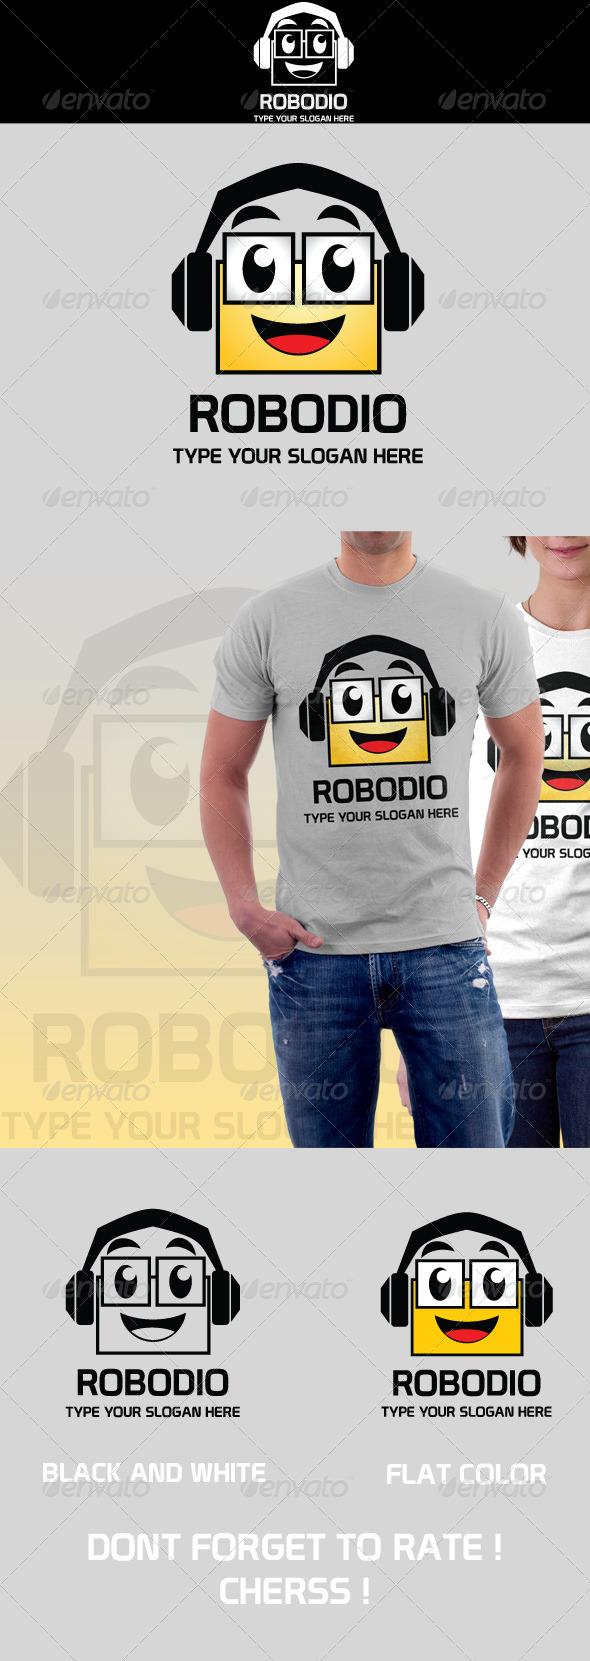 GraphicRiver Robodio Logo 4956148